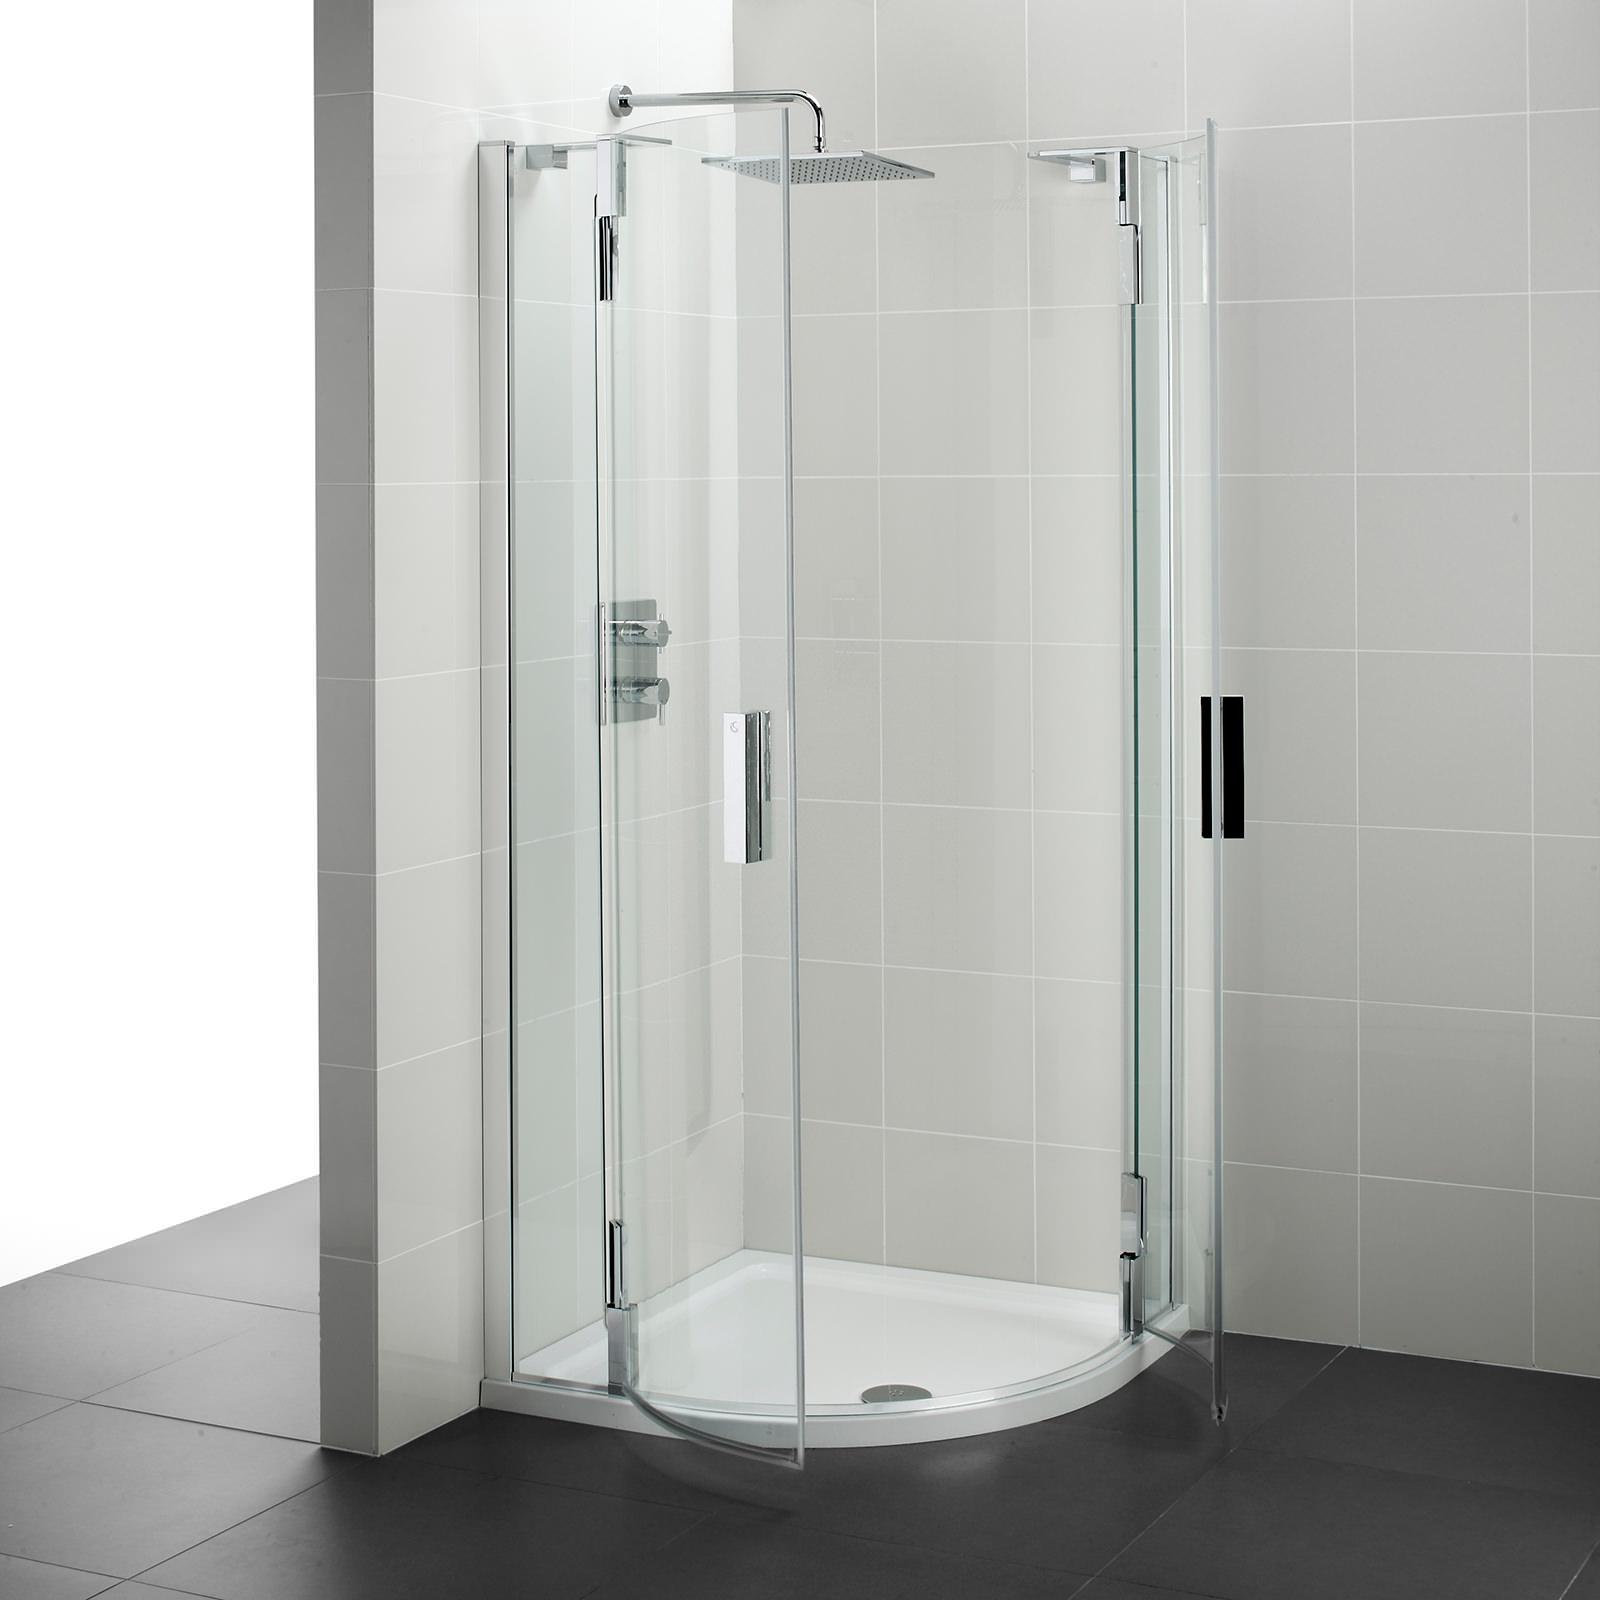 Ideal Standard Tonic Upstand 900 Hinged Quadrant Shower